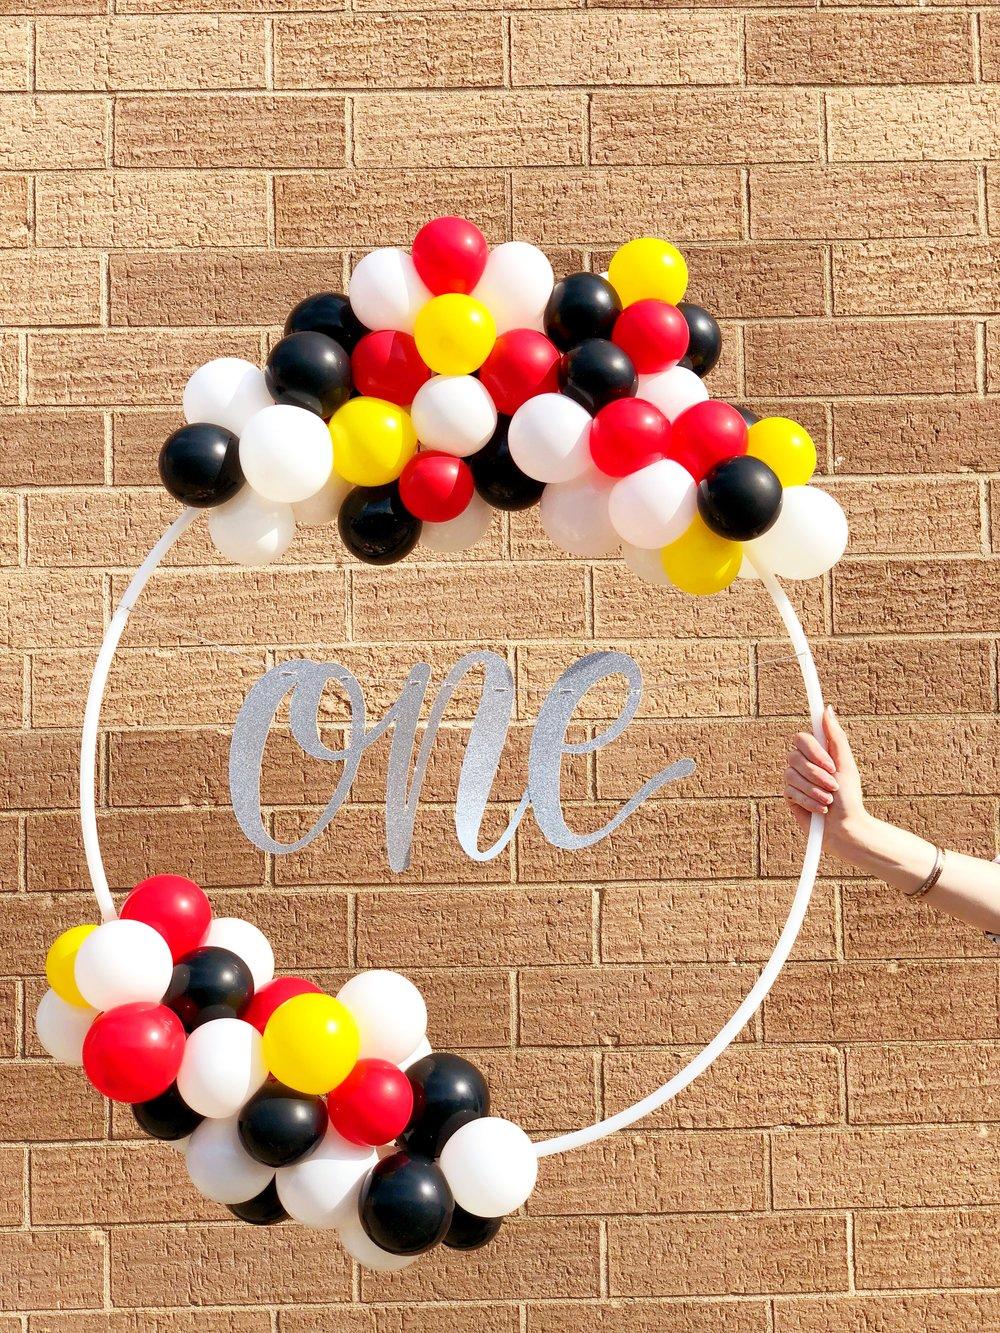 vroom_vroom_balloon_wreath_mickey_mouse_one.JPG